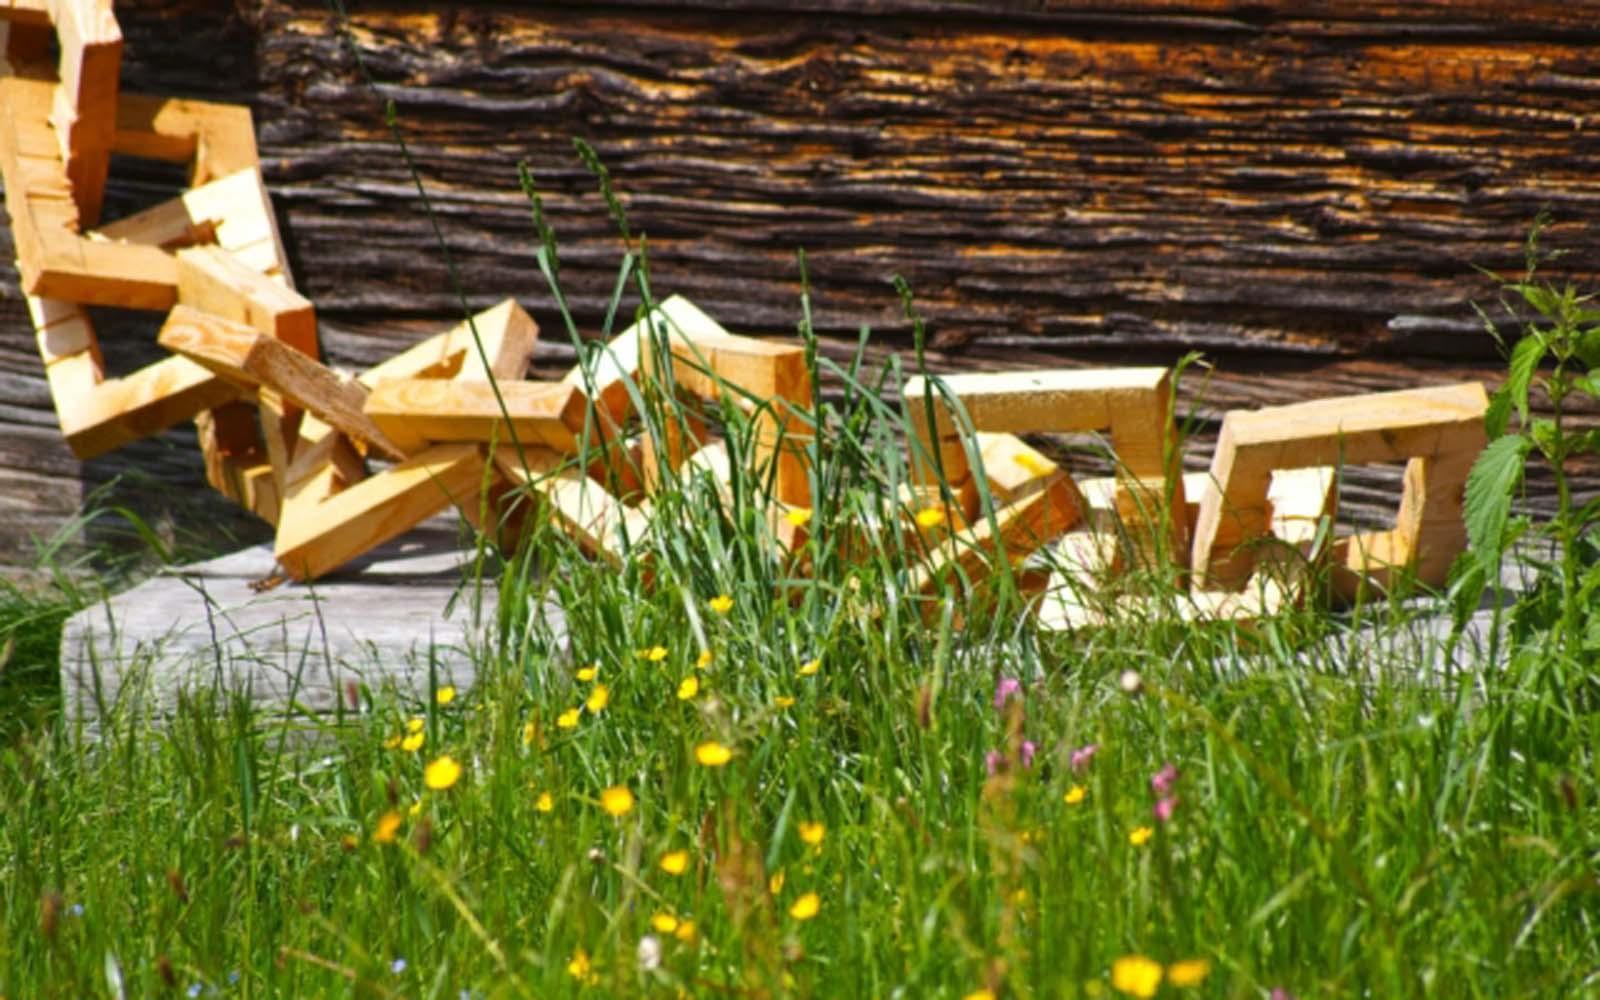 wood art from Austria